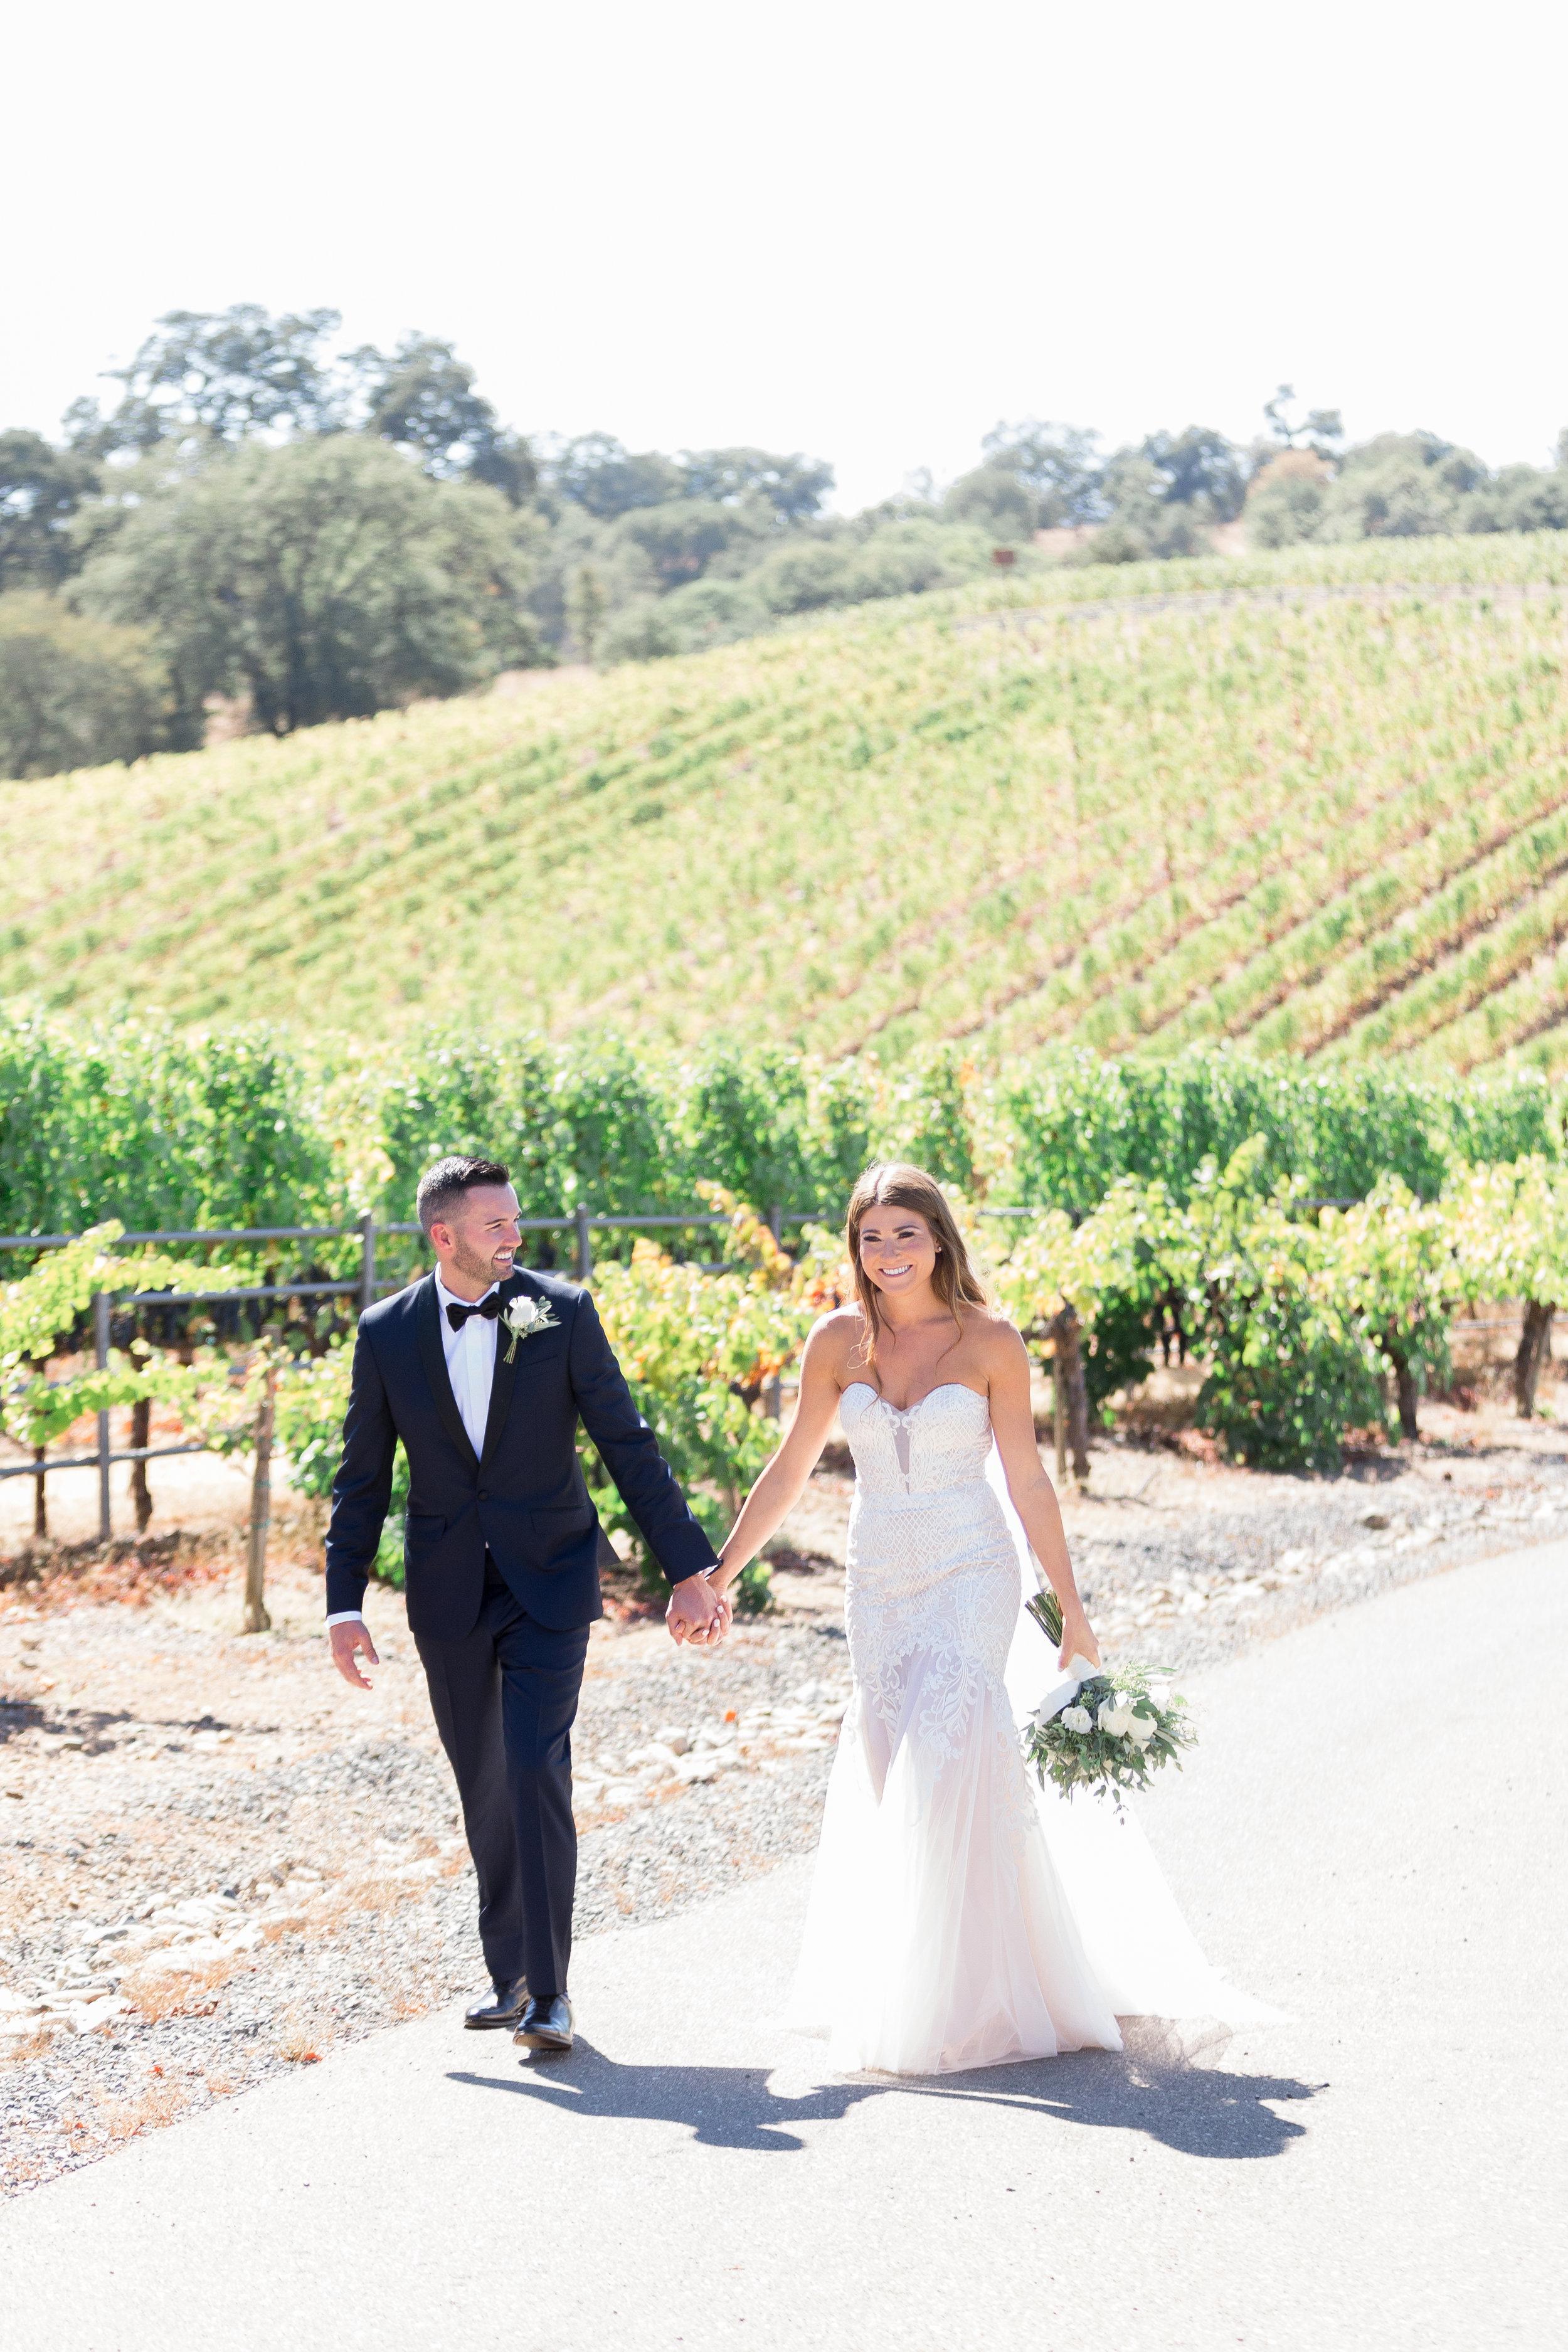 Calegari-Vineyards-Healdsburg-Wedding-Photographer (83 of 262).jpg